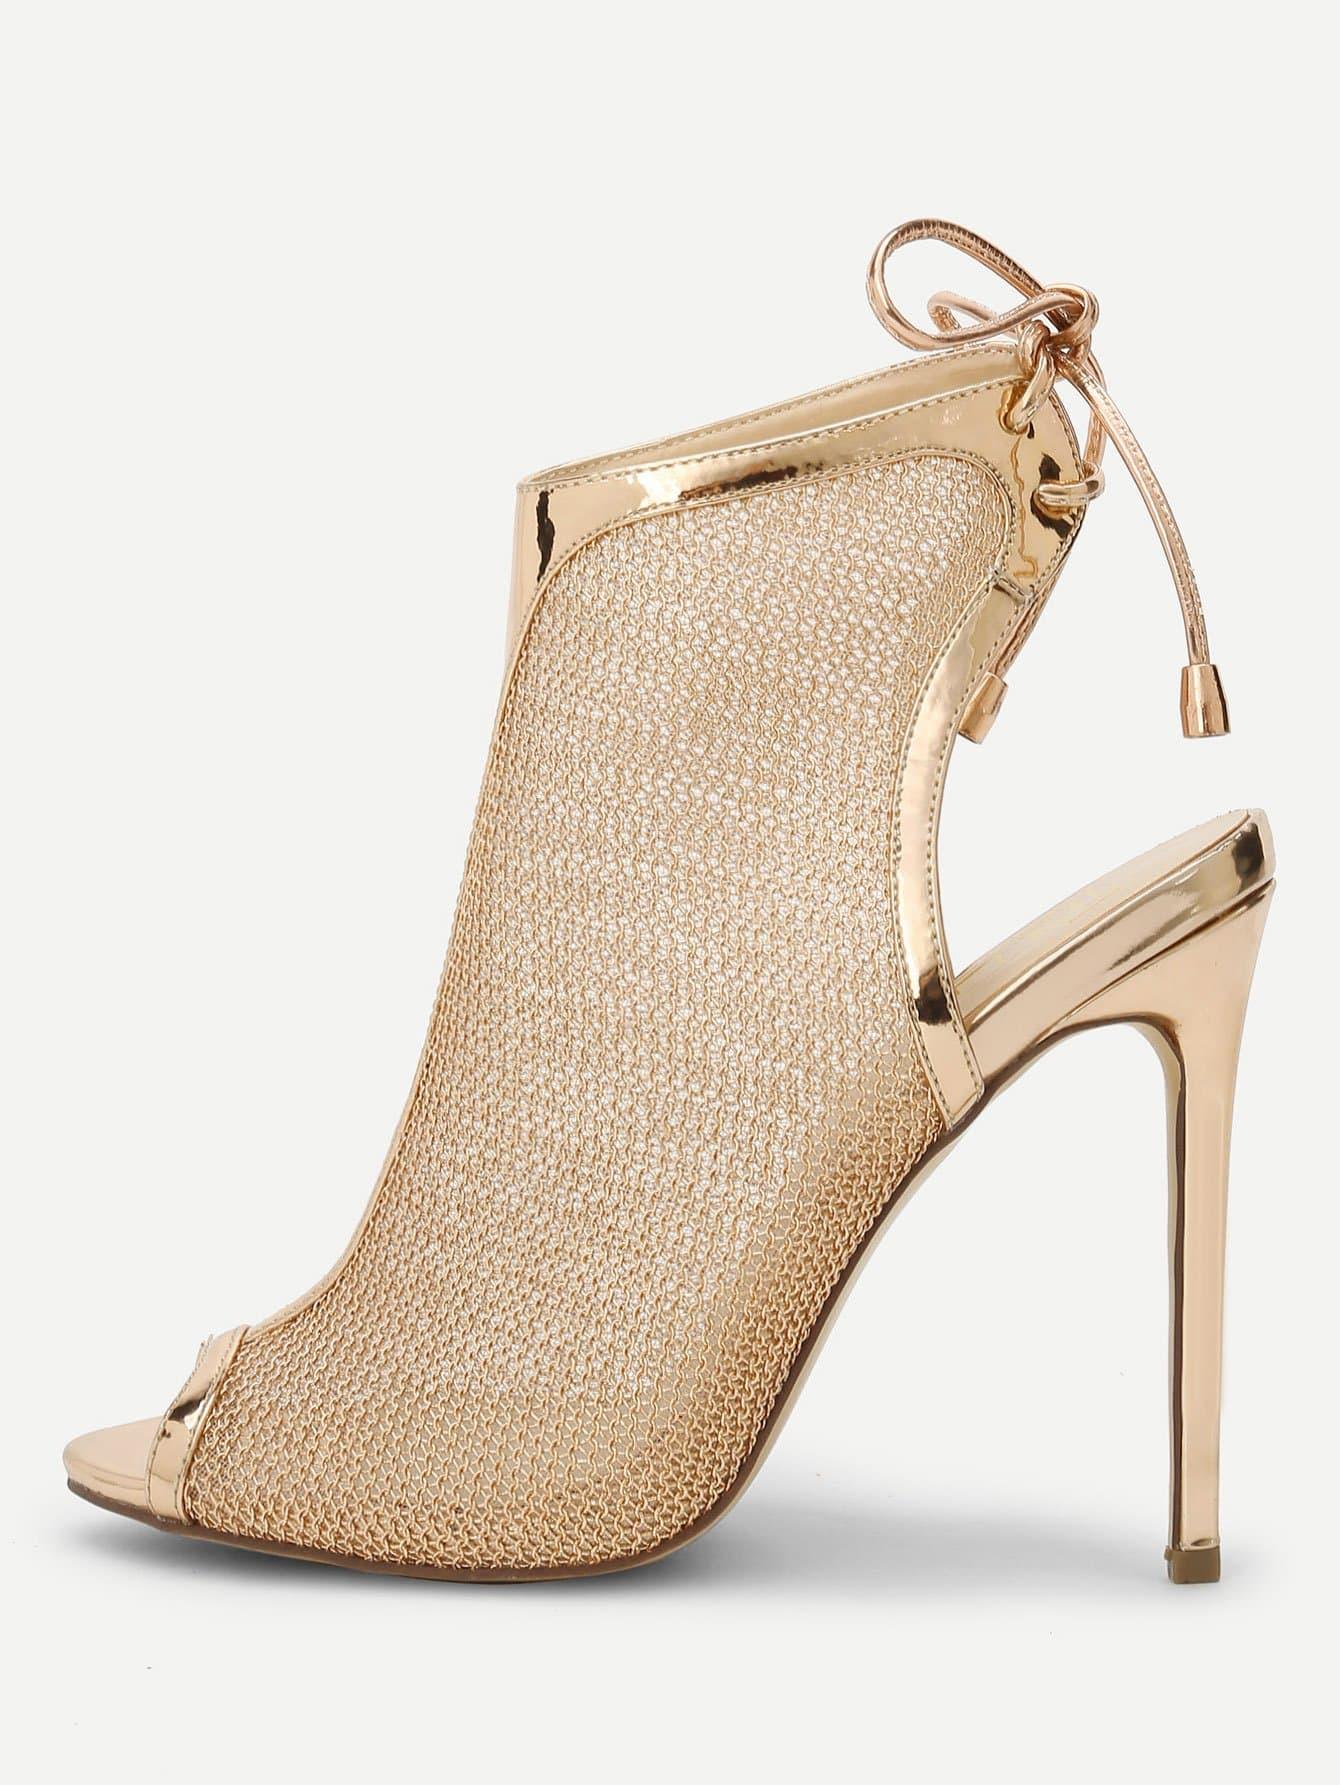 History of high heels fashion 46